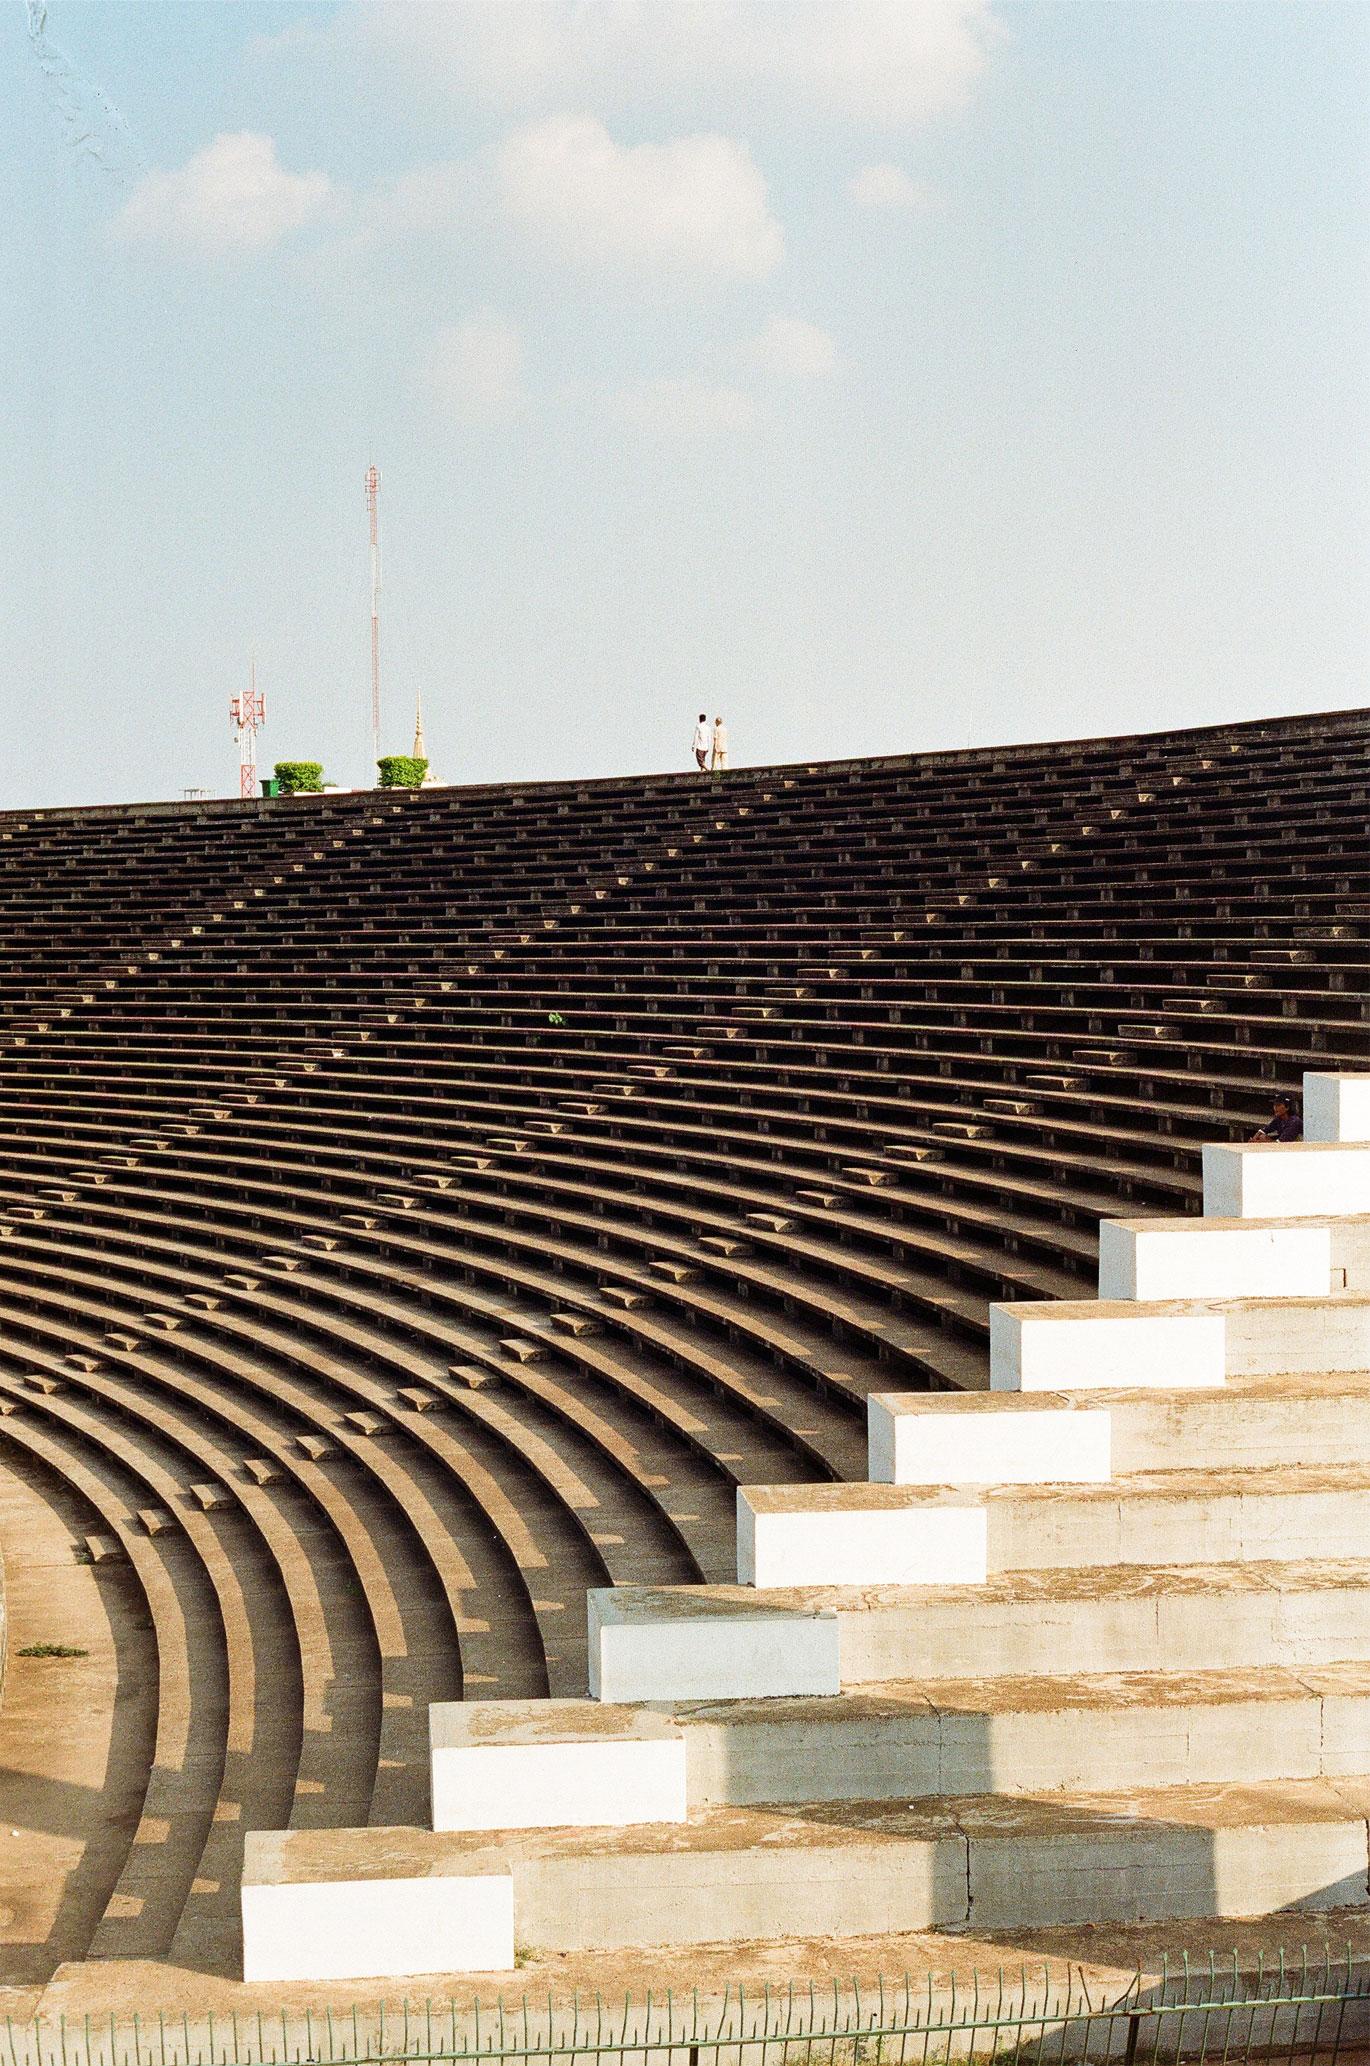 Olympic Stadium Phnom Penh Vann Molyvann